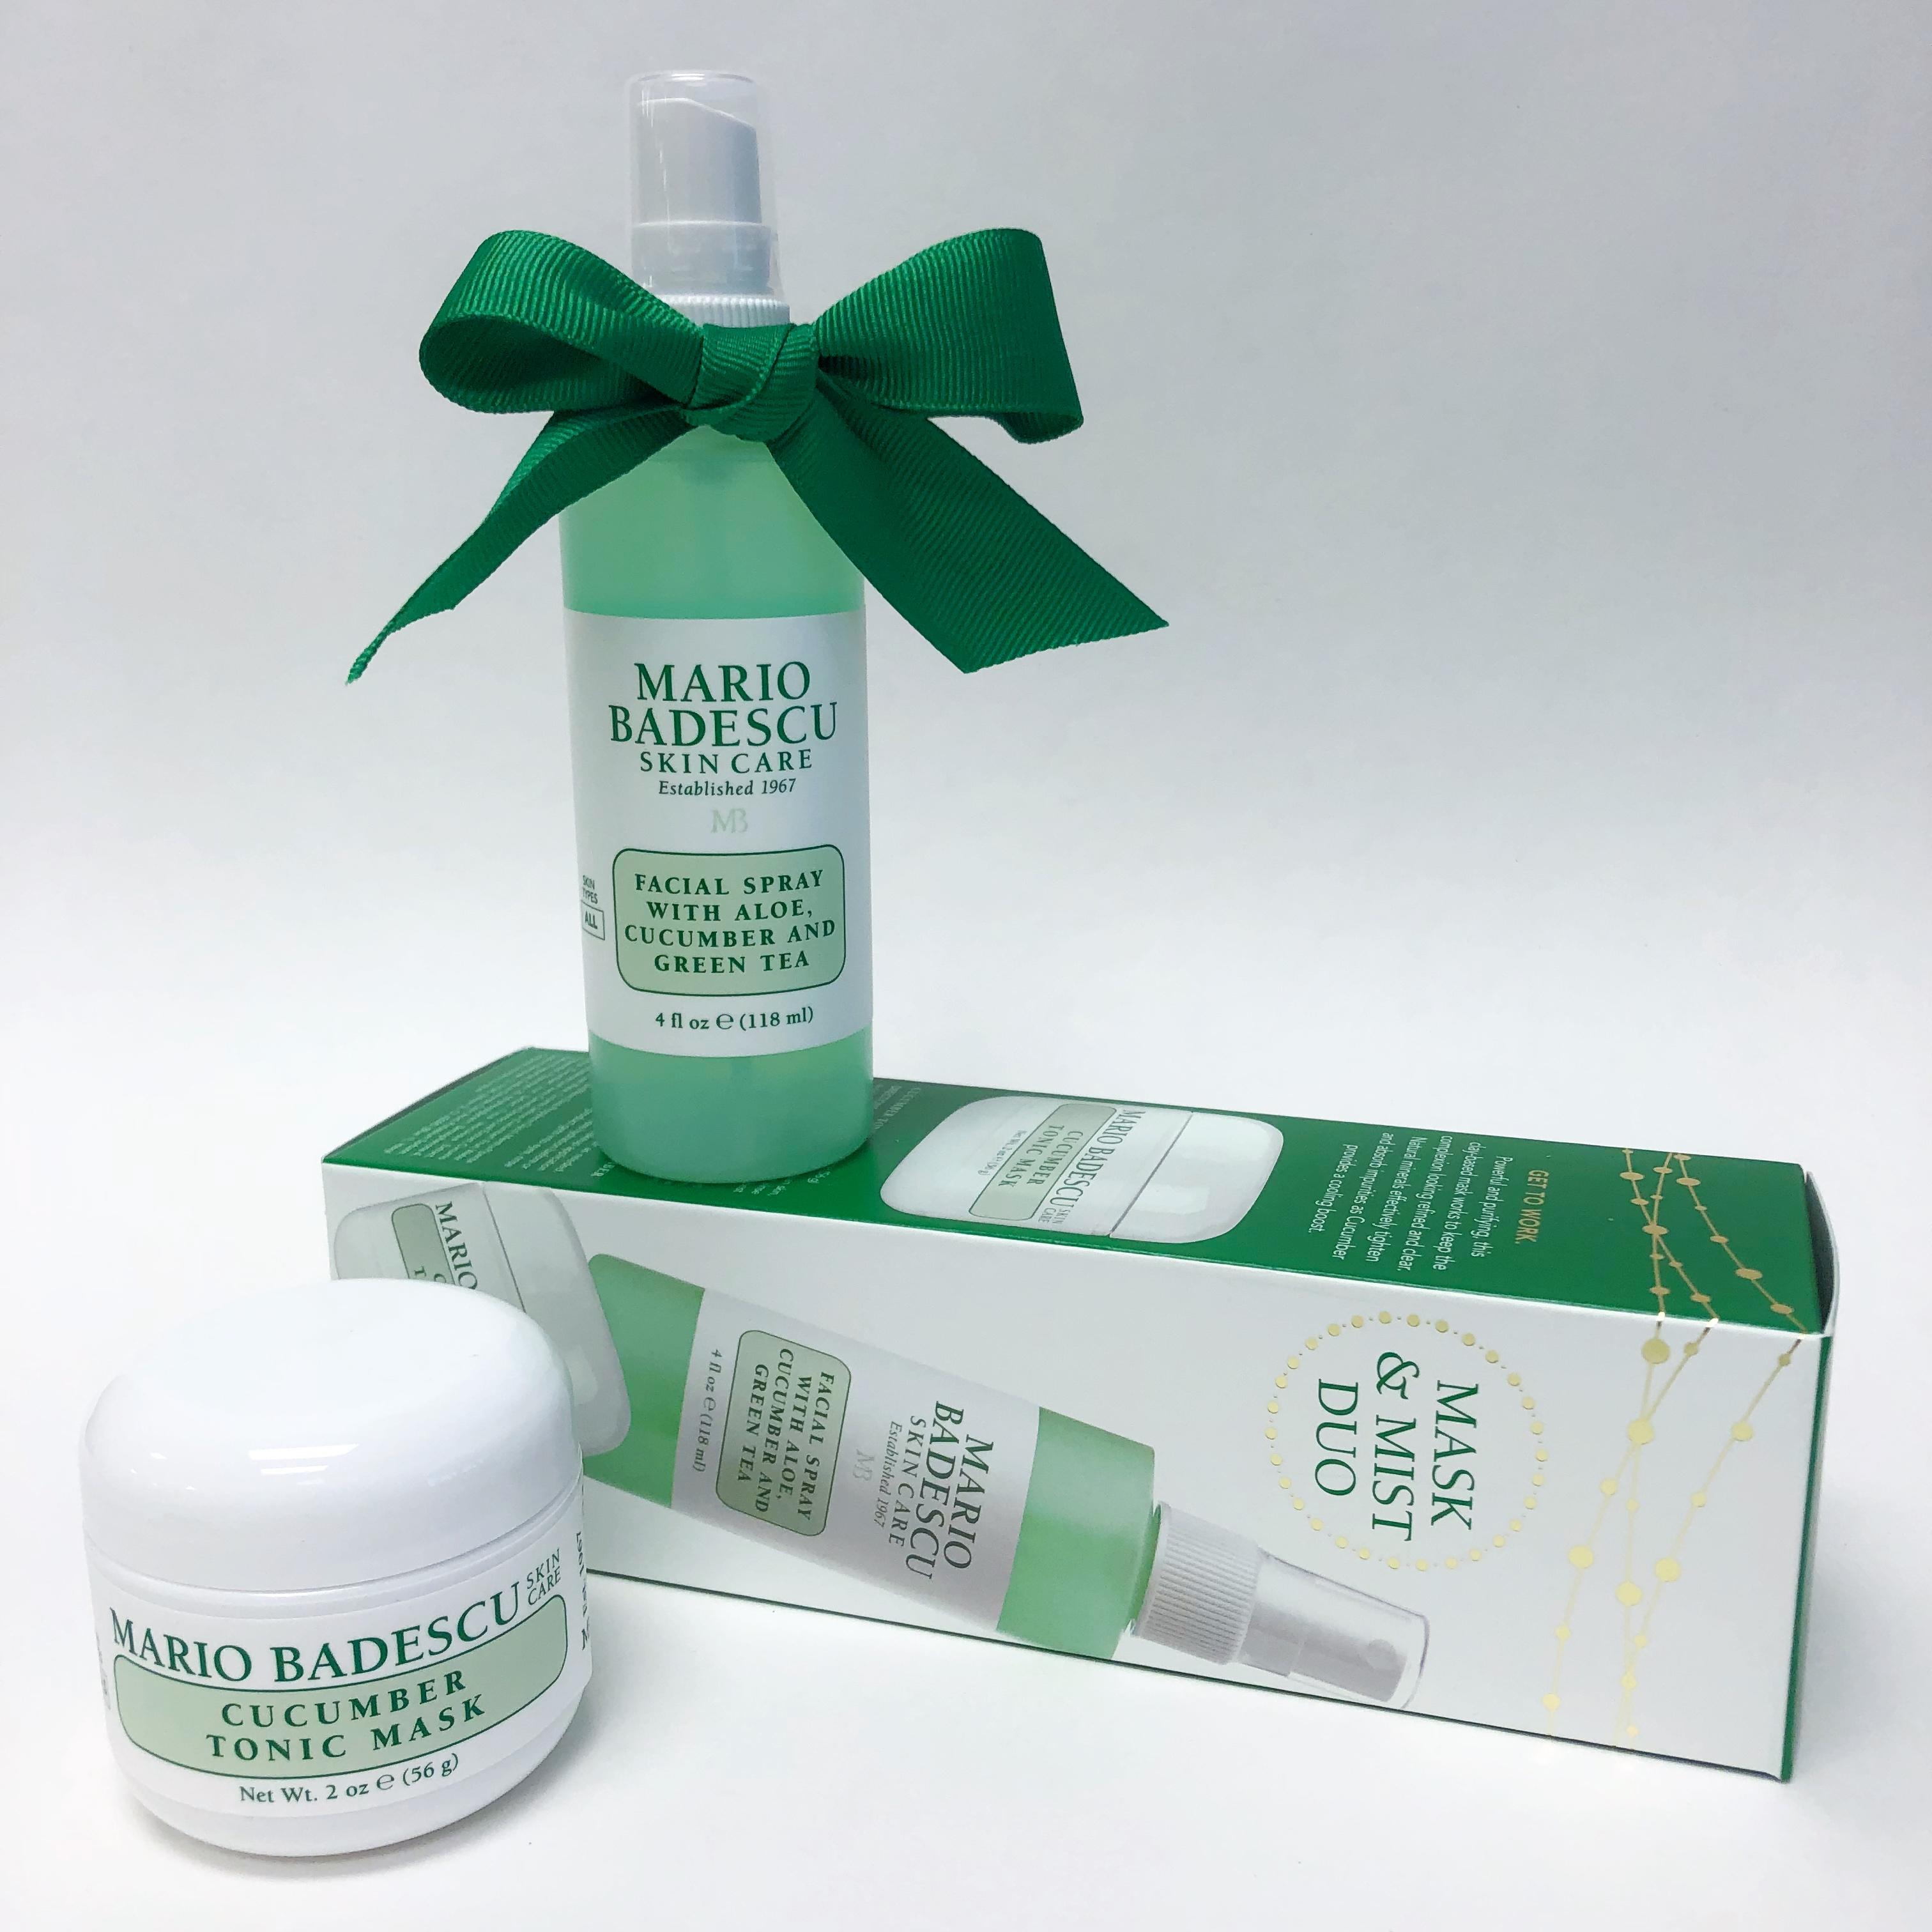 Mario Badescu Cucumber Mask & Mist Duo Holiday Gift Set